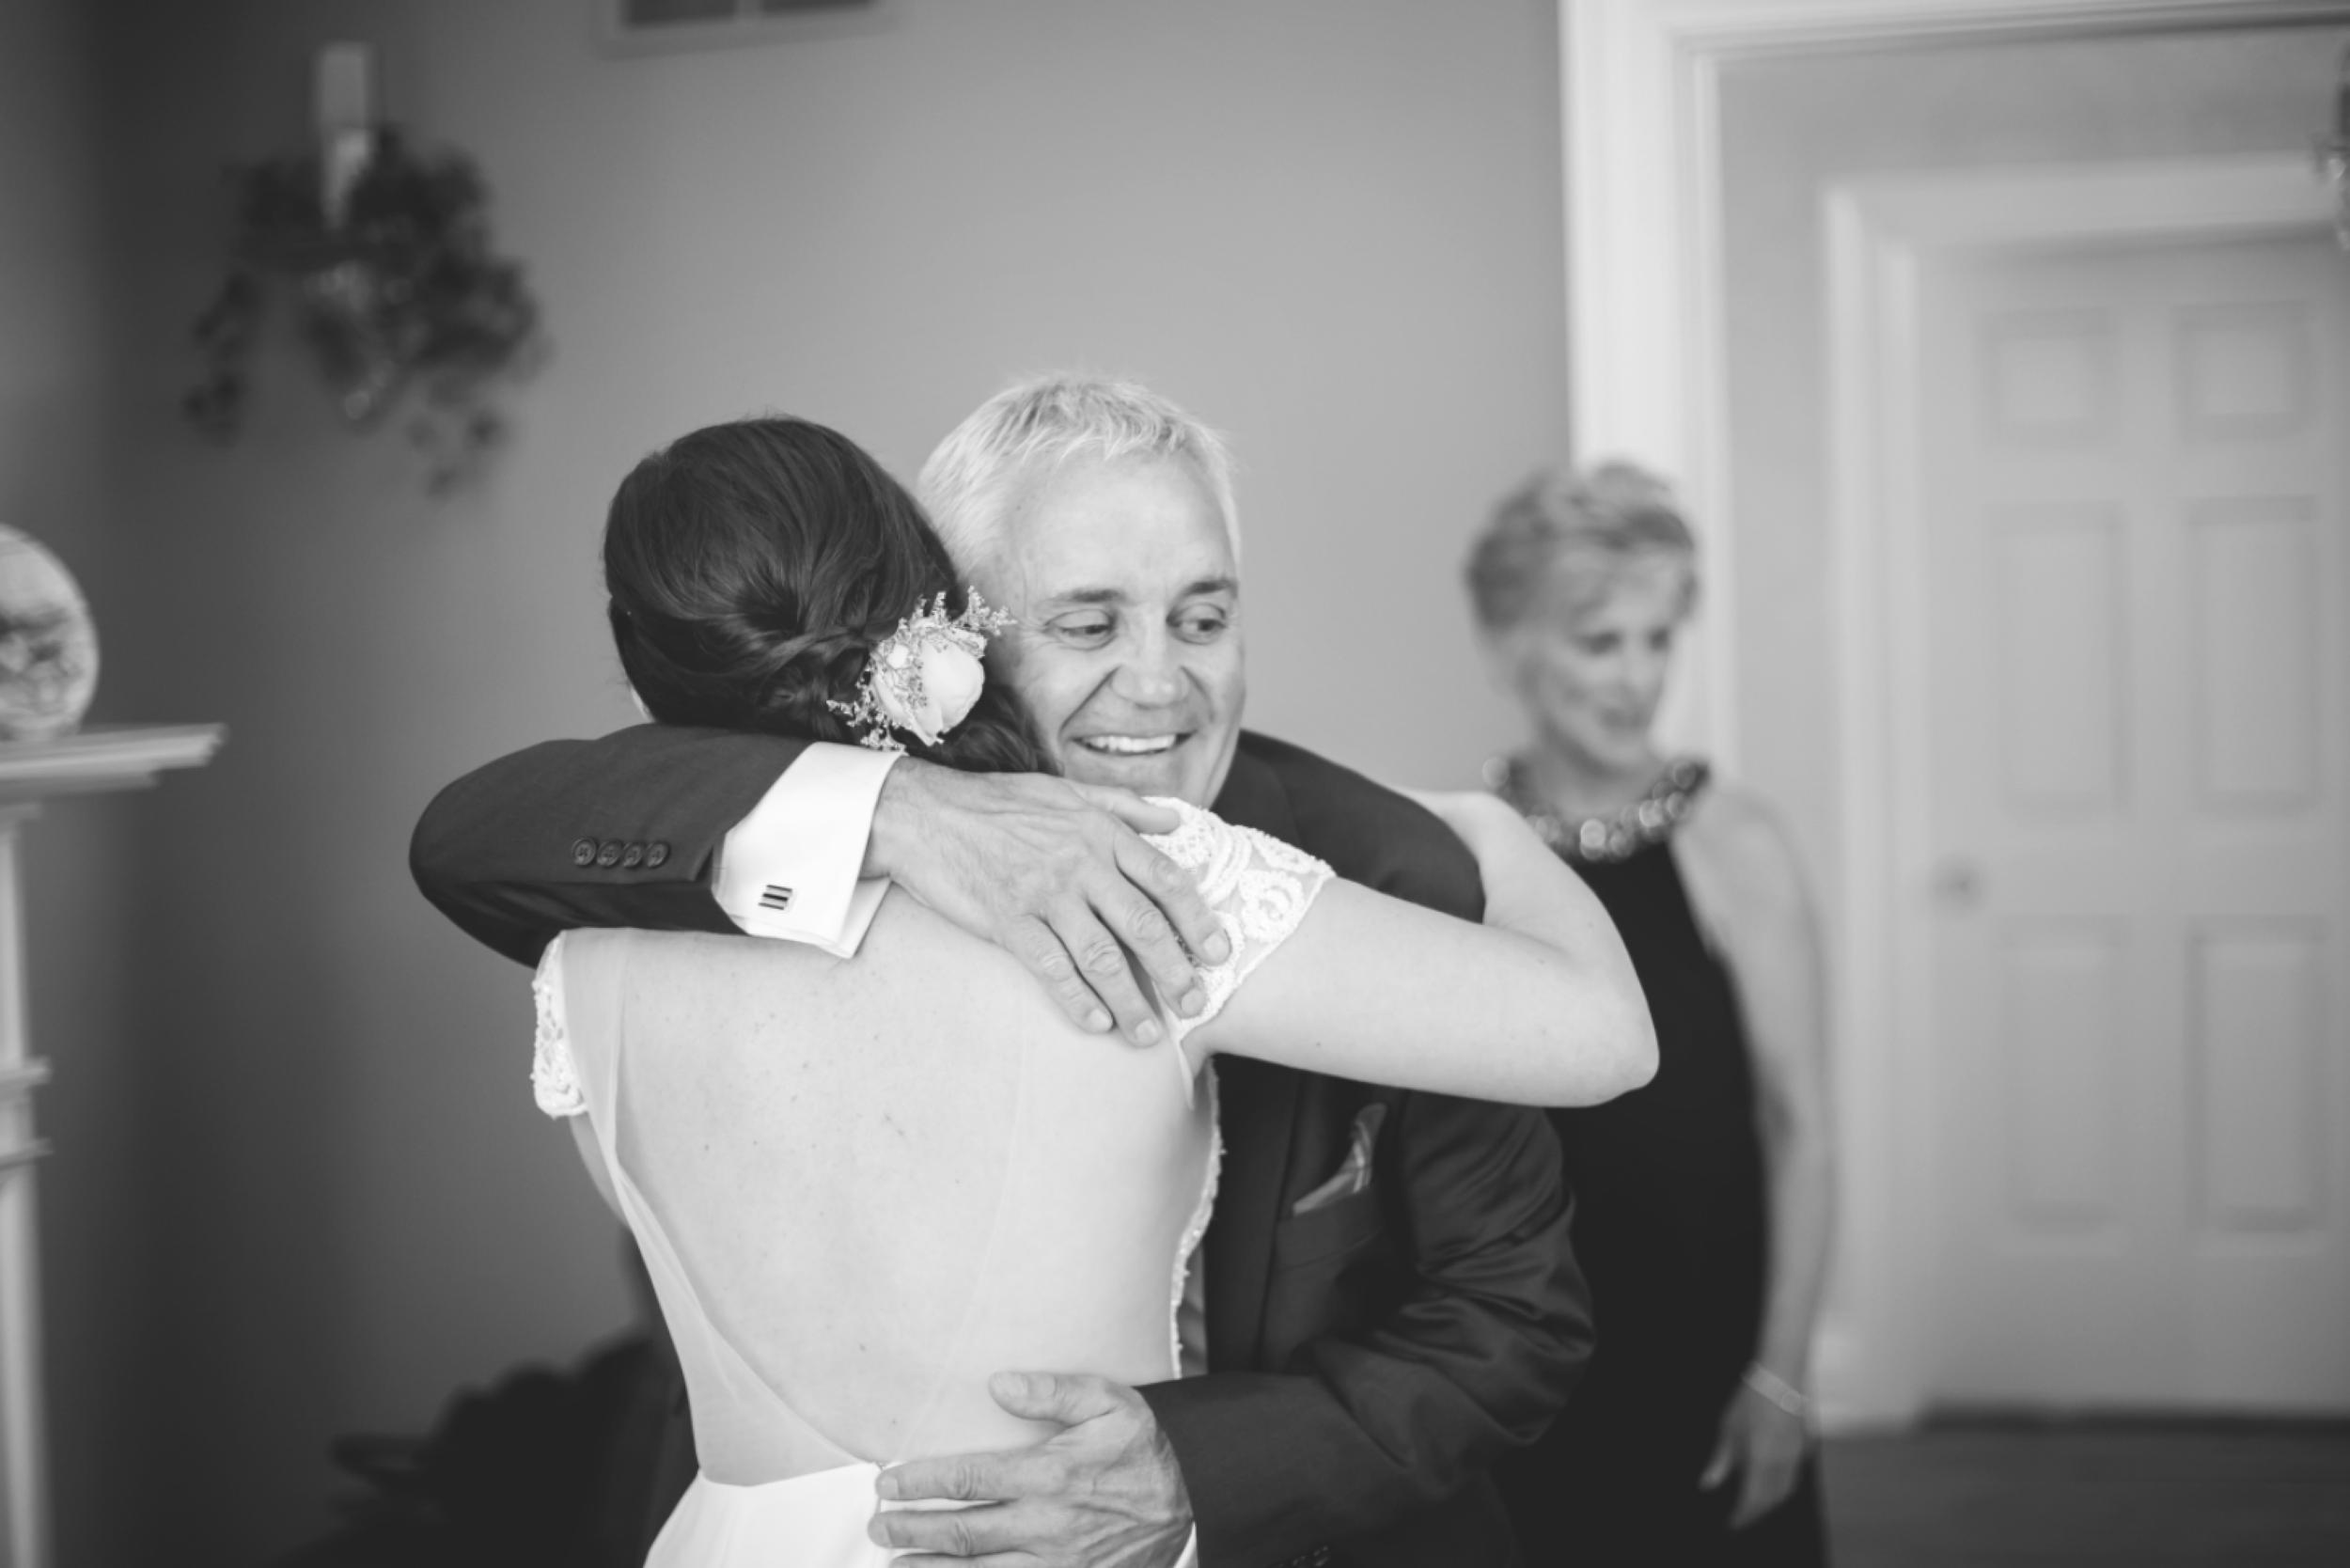 Wedding-Kurtz-Orchard-Market-Niagara-On-The-Lake-Toronto-Hamilton-Burlington-Oakville-Niagara-Wedding-Photographer-Photography-Moments-by-Lauren-Photo-Image-13.png